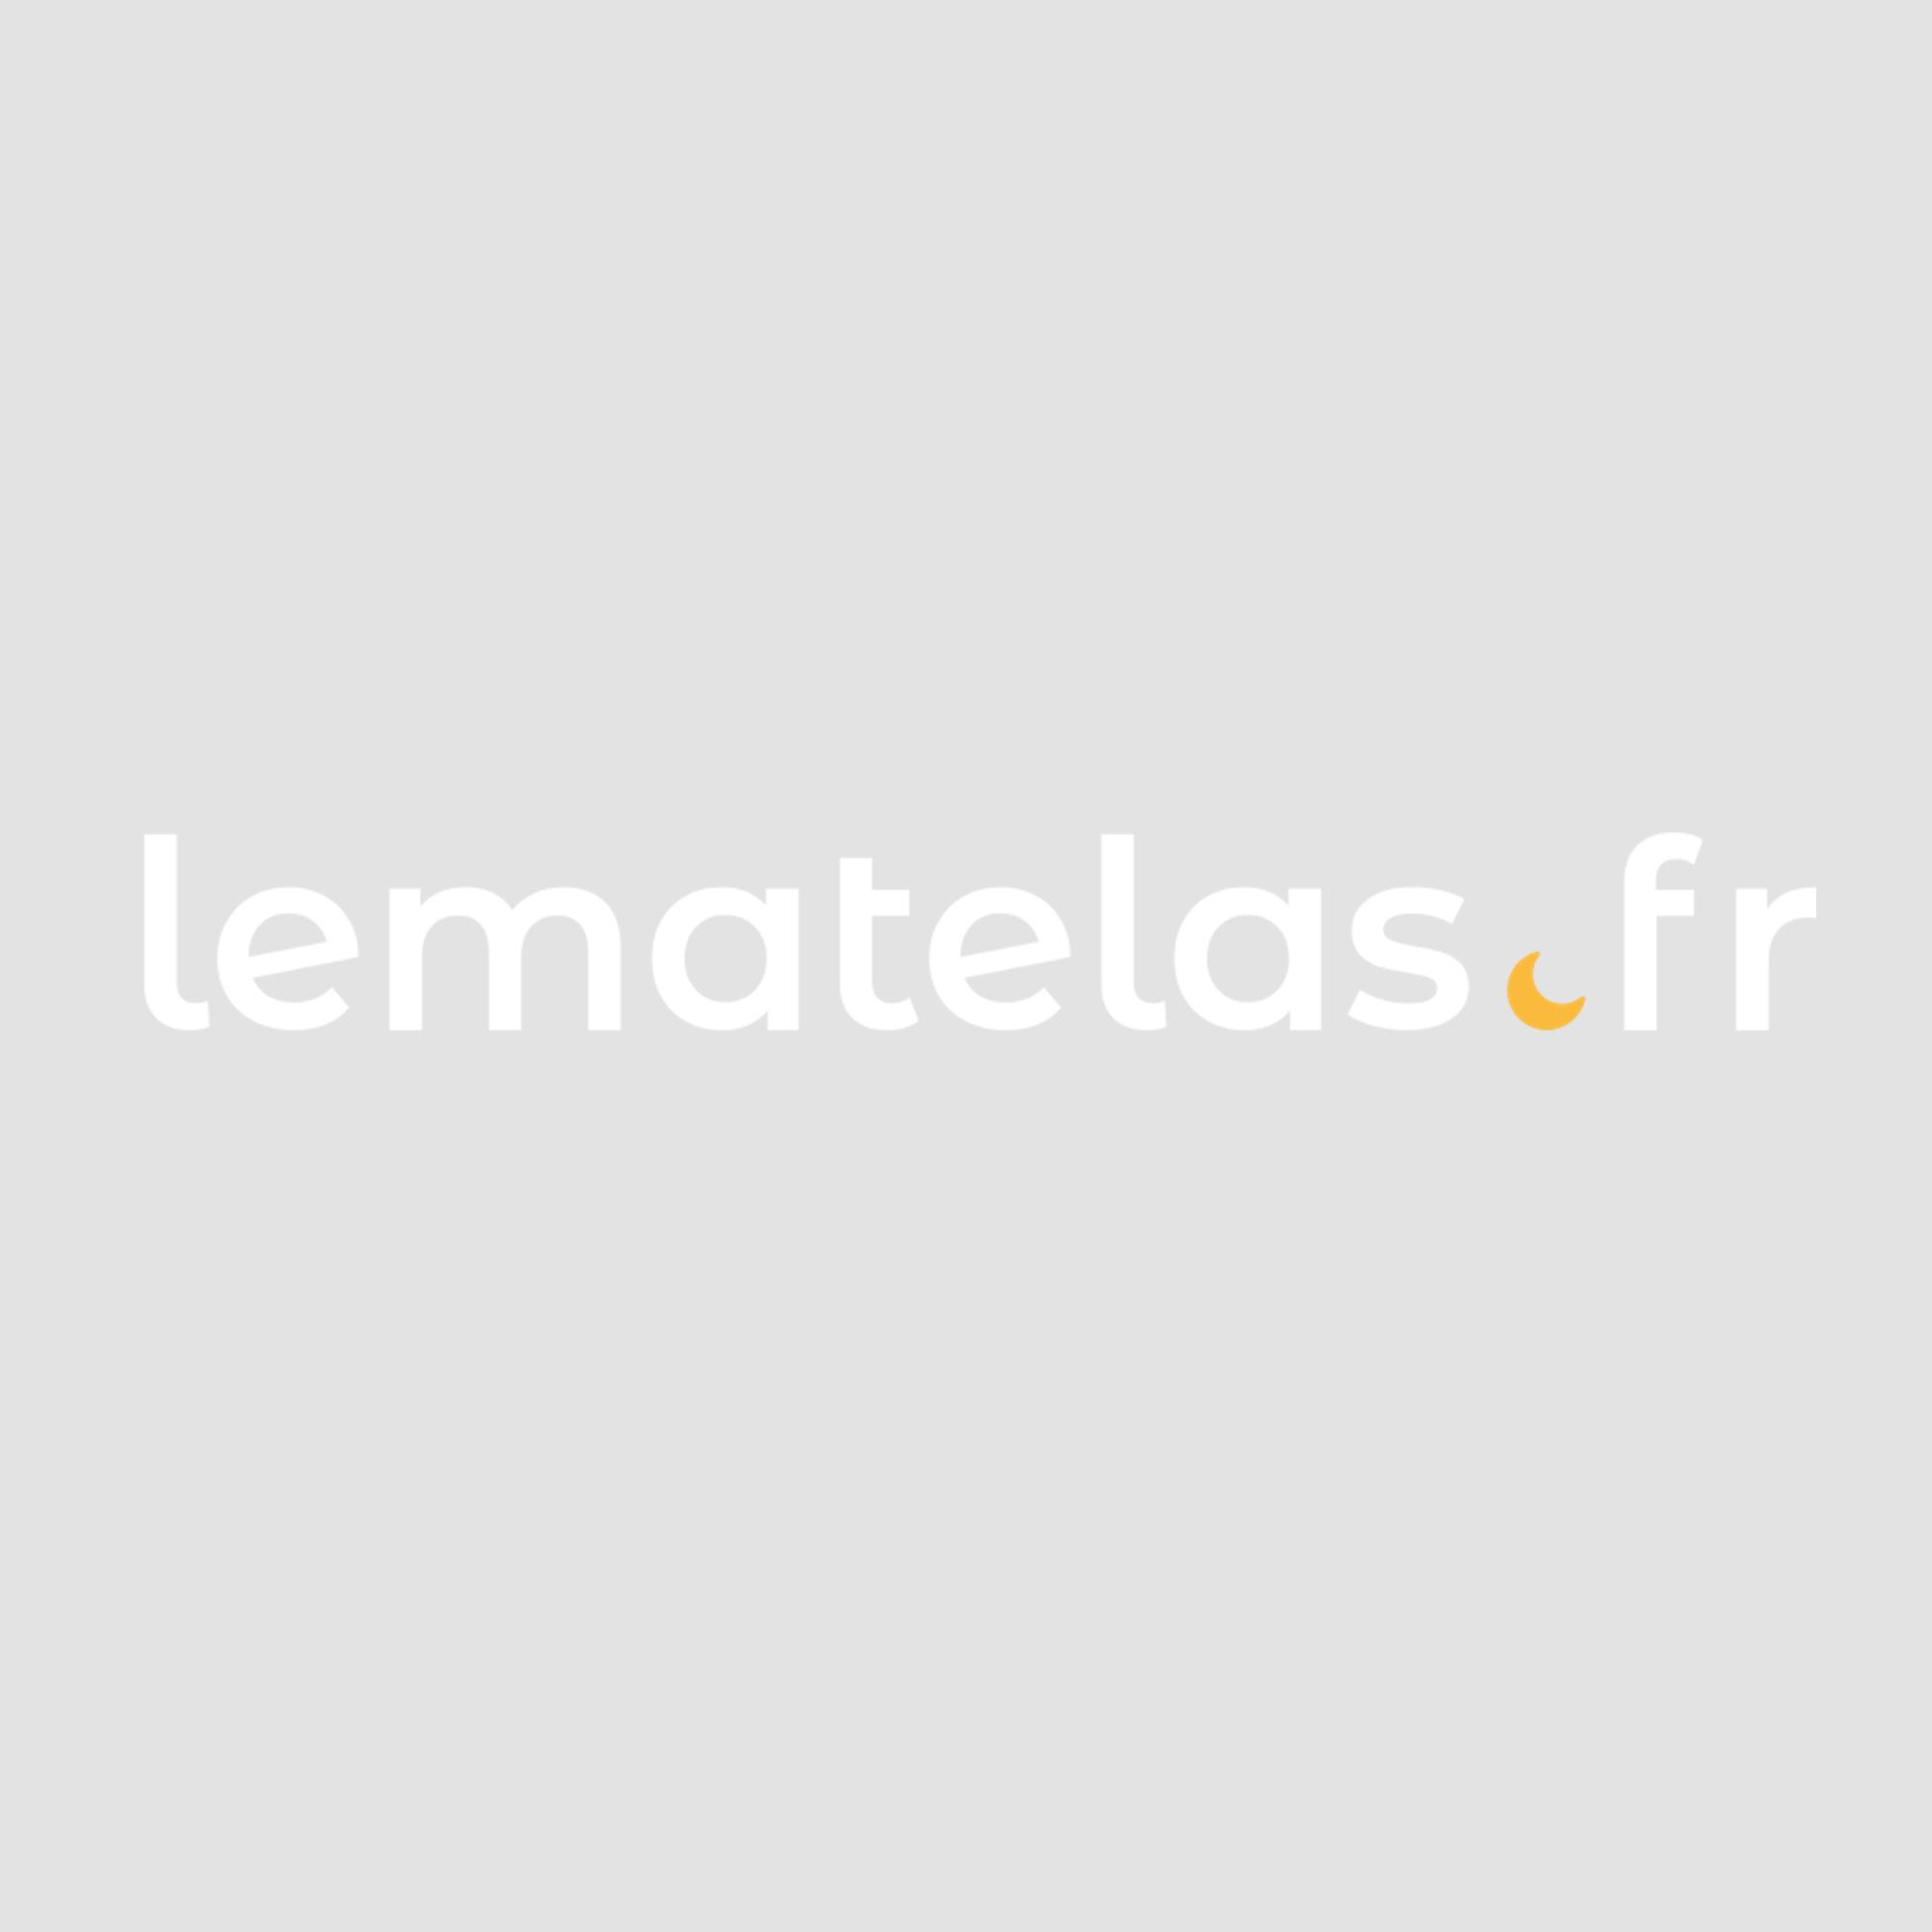 Bureau en bois blanc et imitation chêne avec tiroir